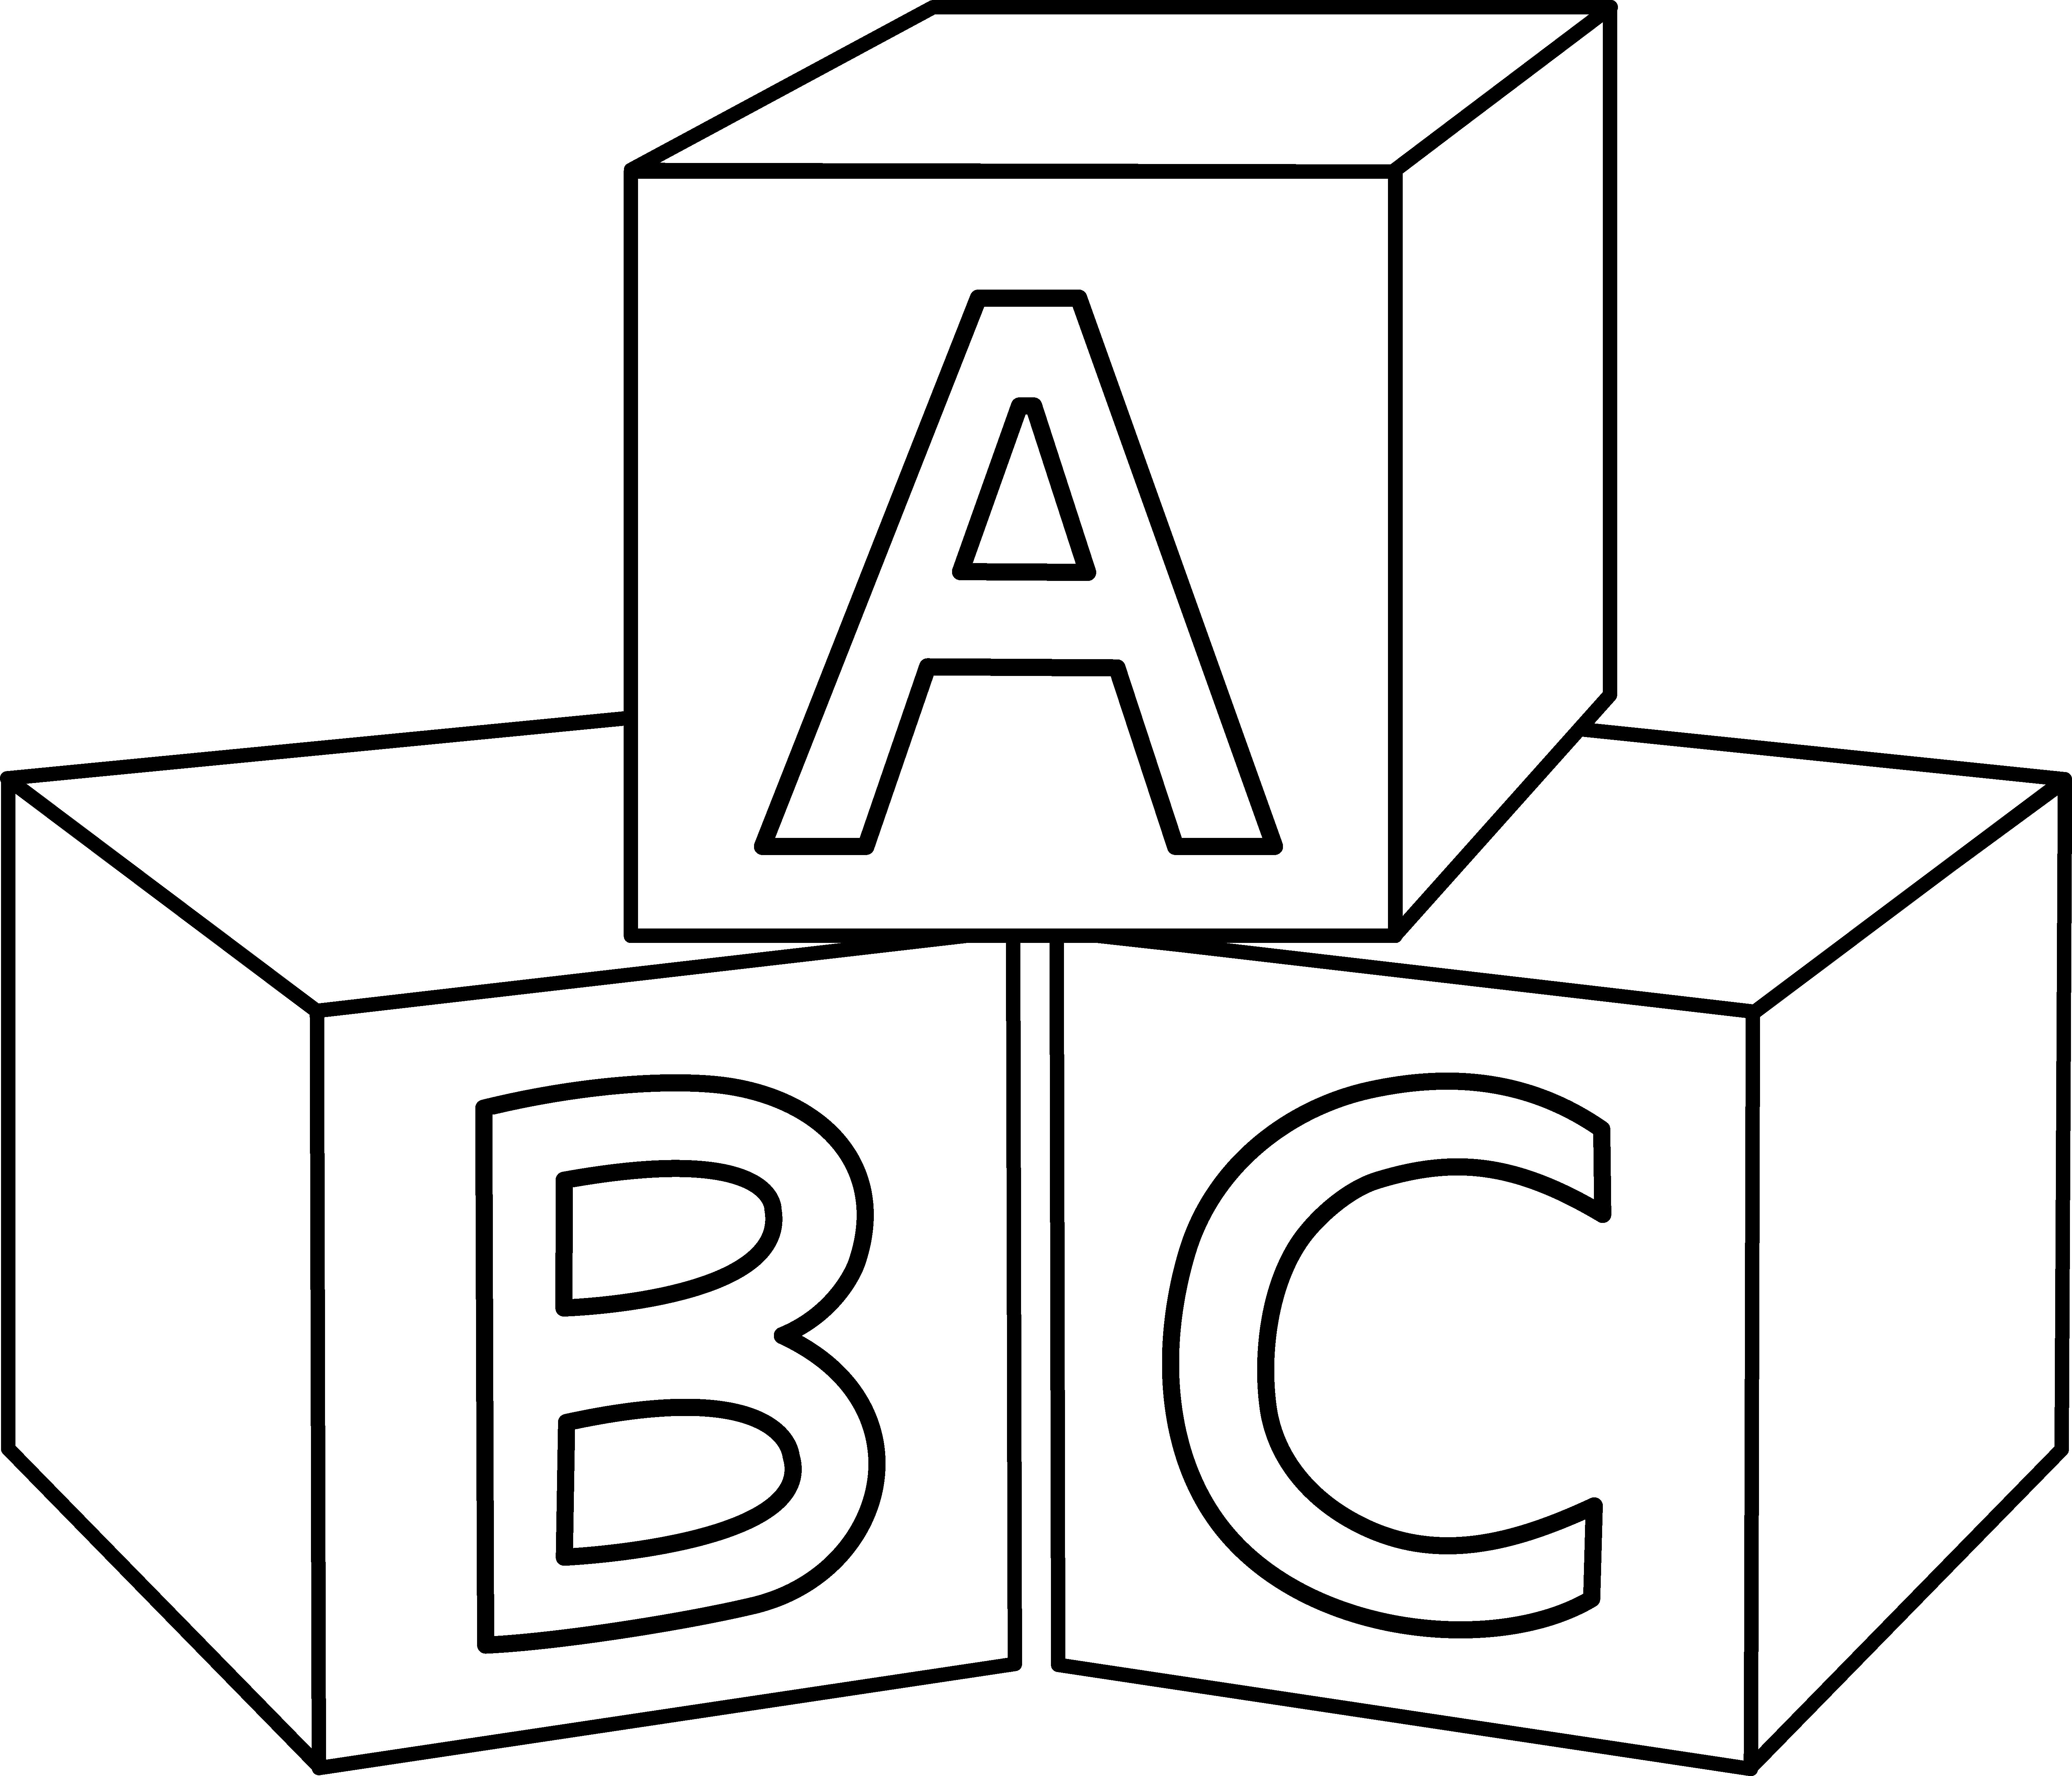 ABC Blocks Design | mirror image transfer | Alphabet blocks, Baby ... graphic transparent stock